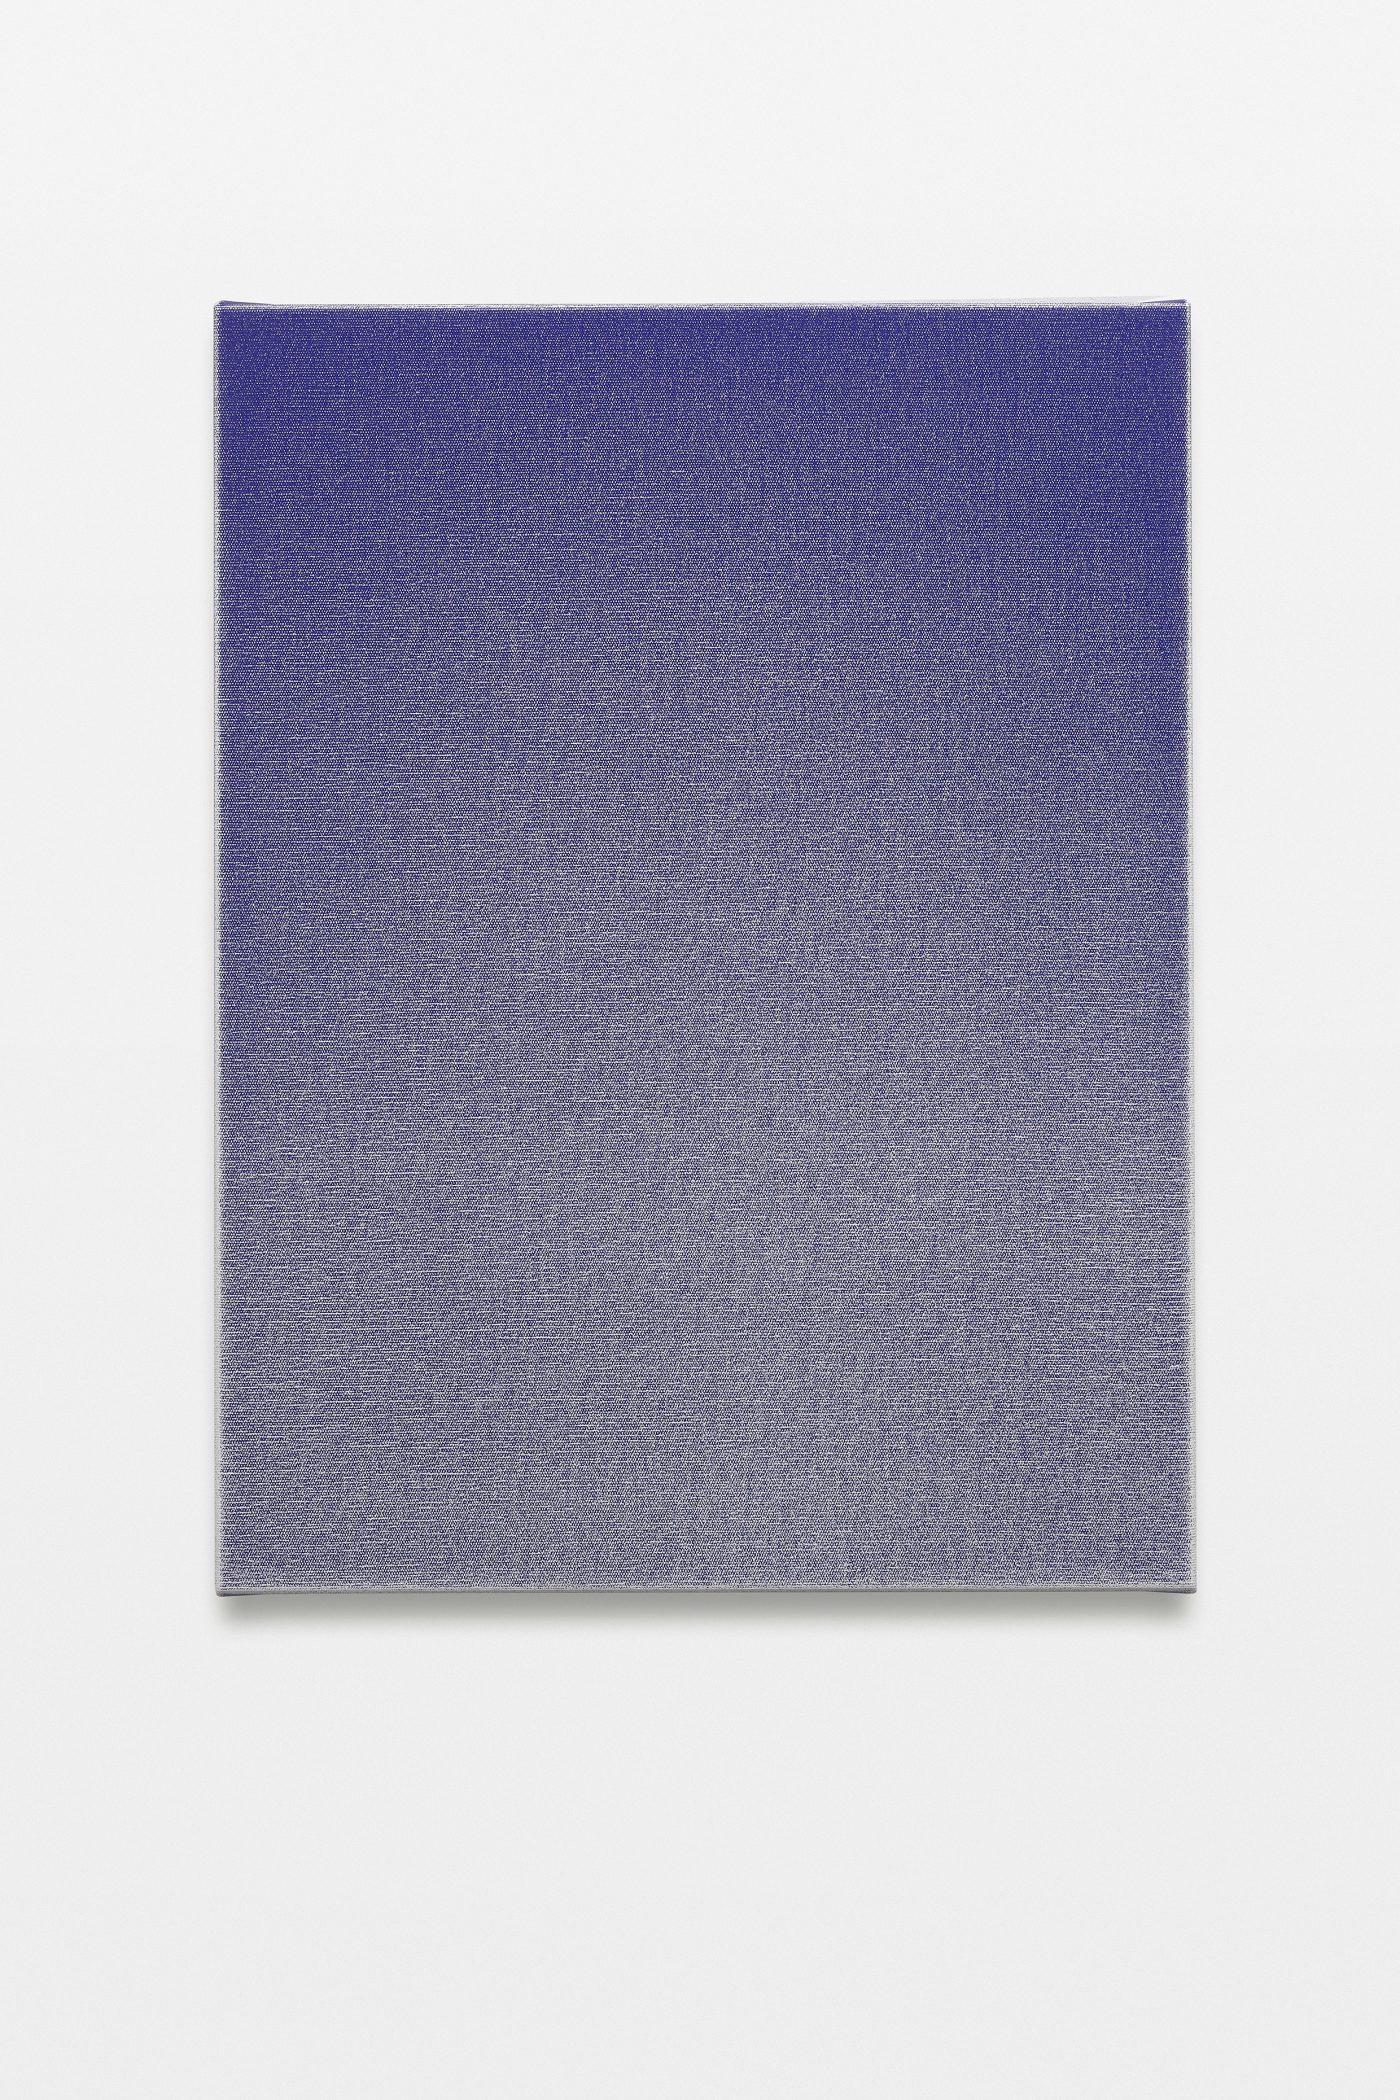 Galerie Lange + Pult – Thomas Wachholz